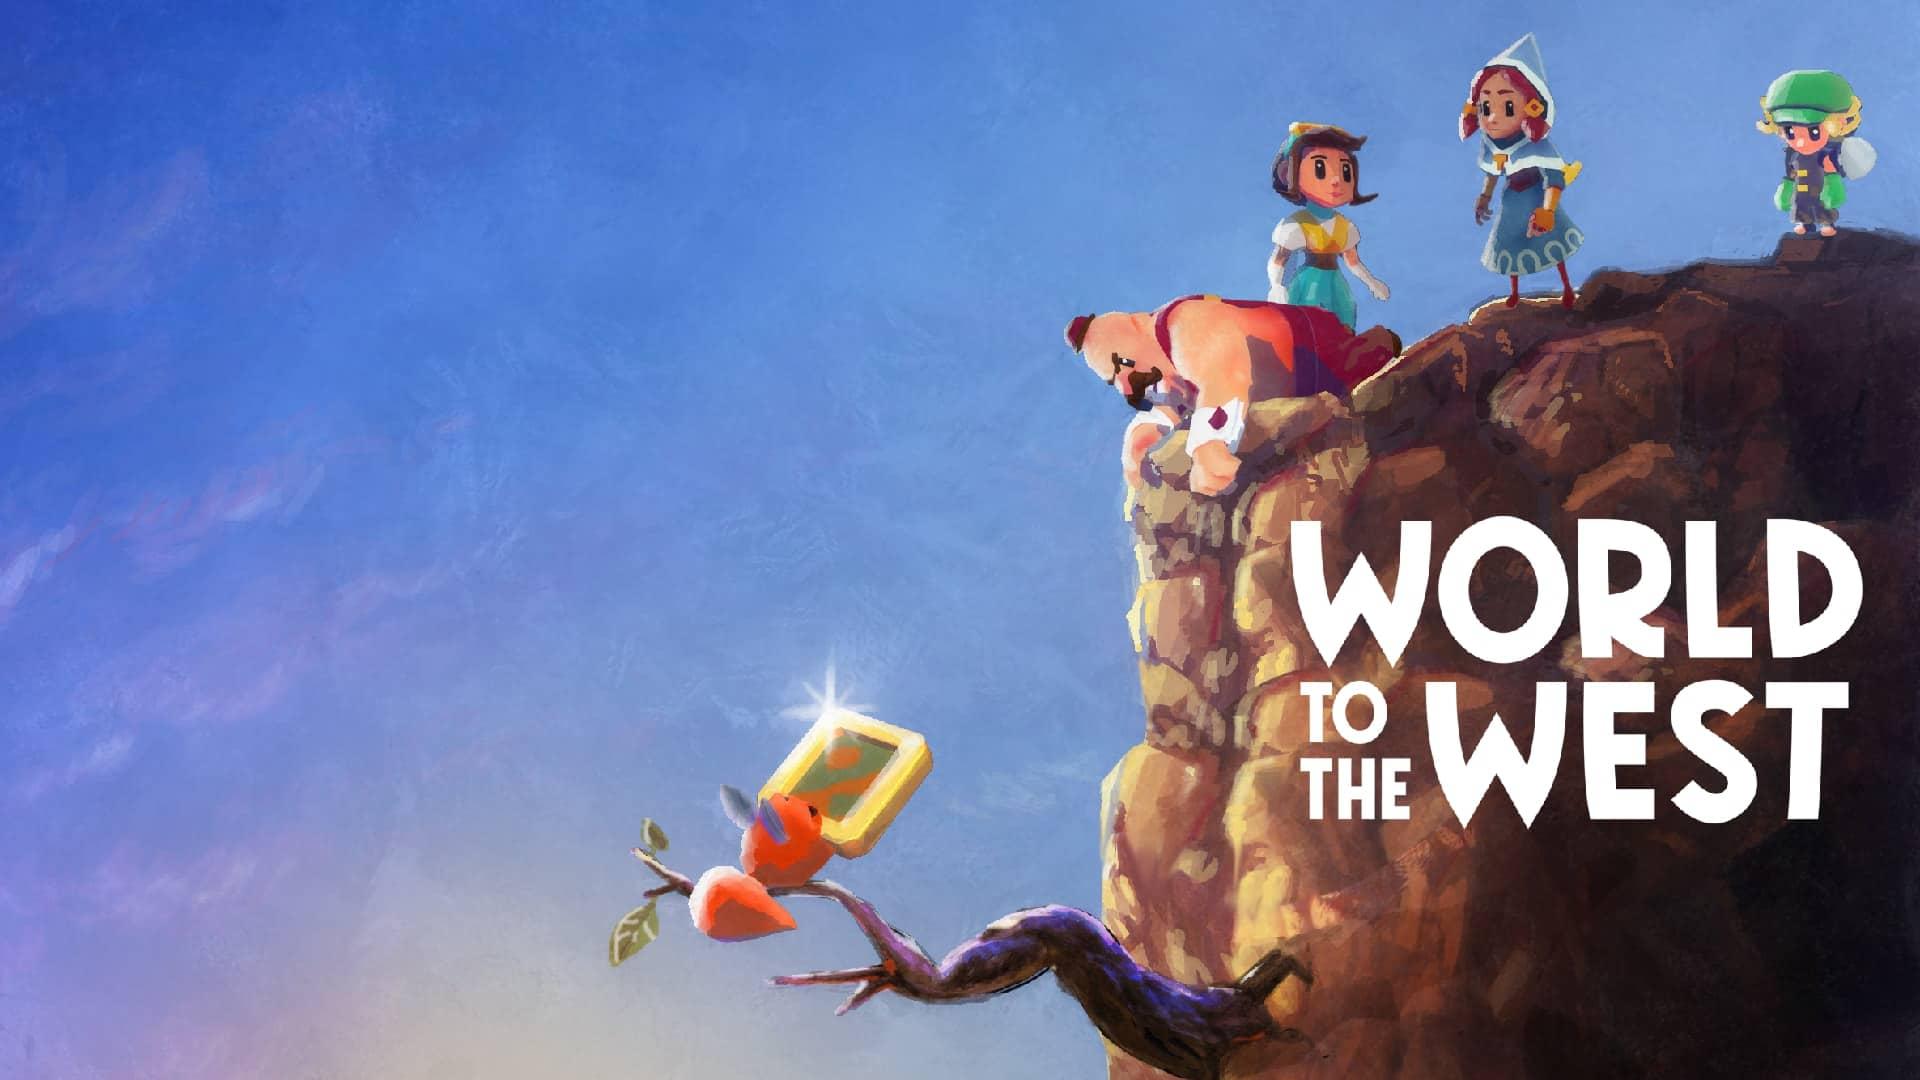 Download World to the West-CODEX + Update v20180530-CODEX